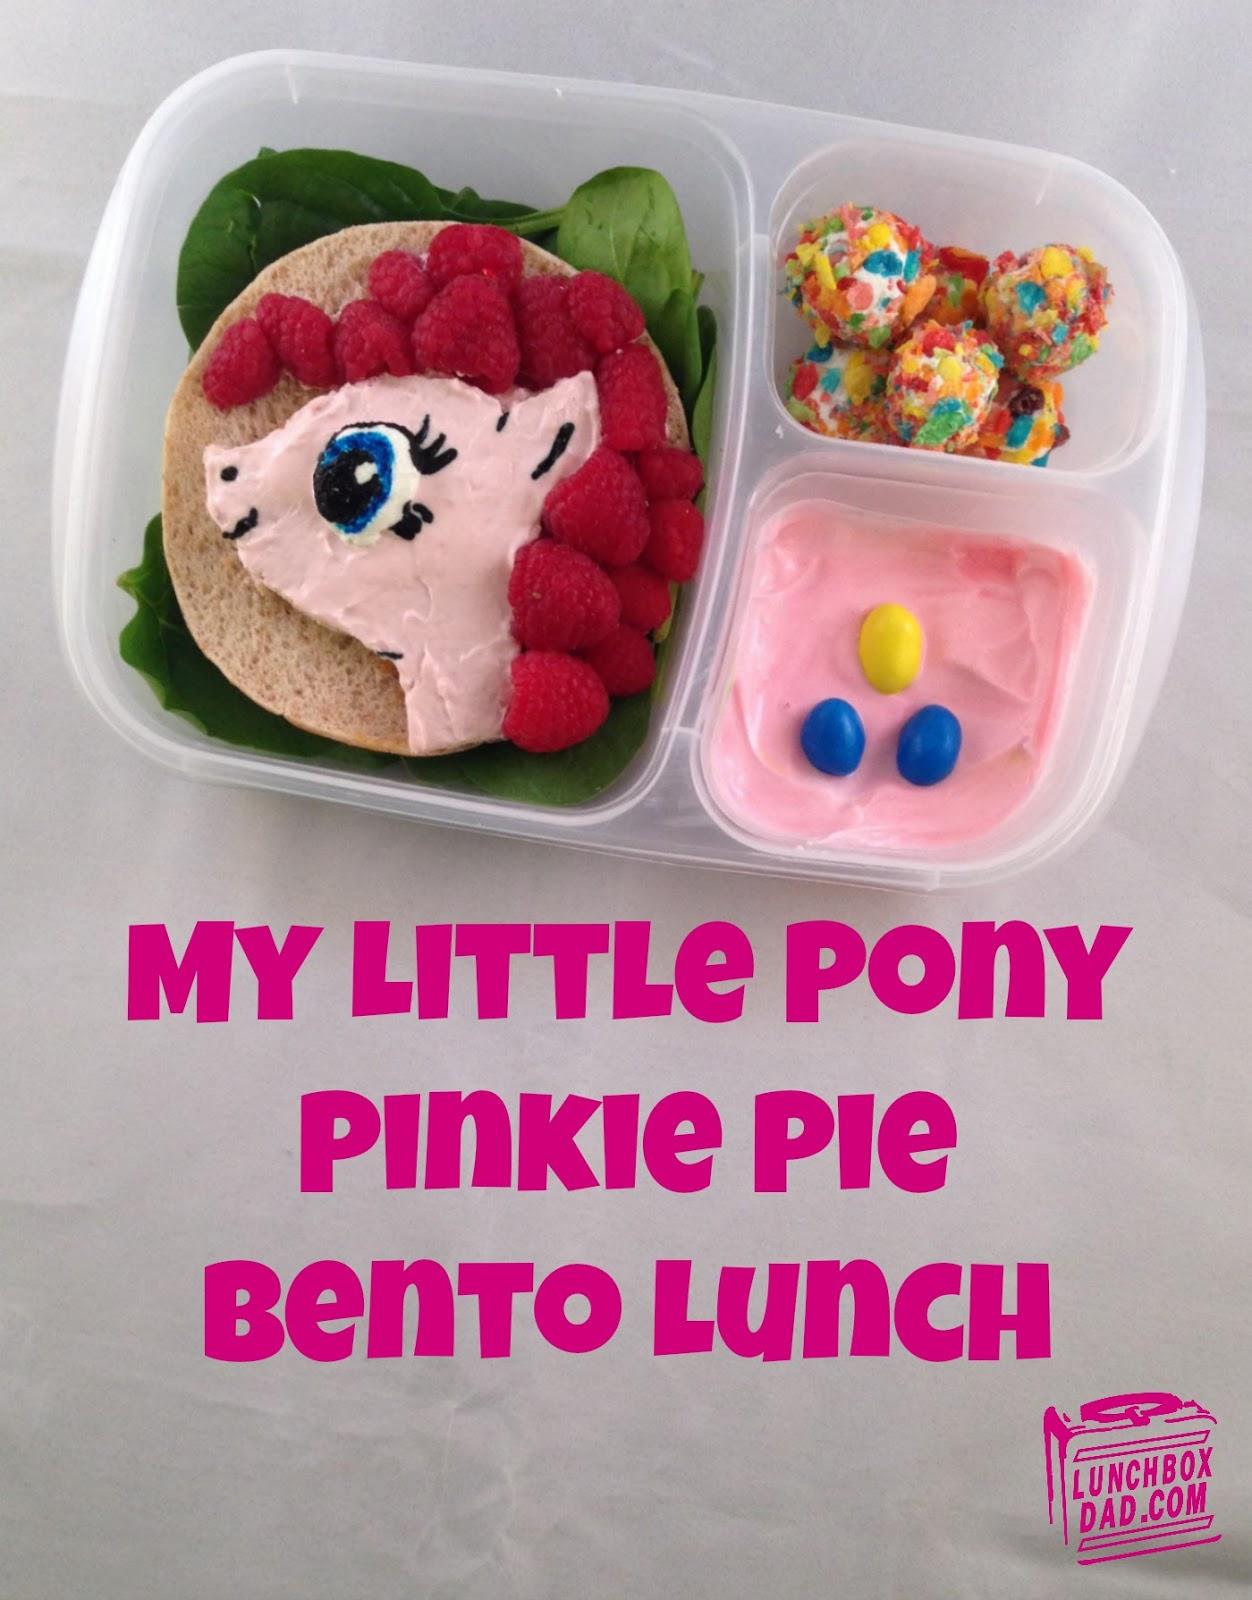 My Little Pony Pinkie Pie Bento Lunch